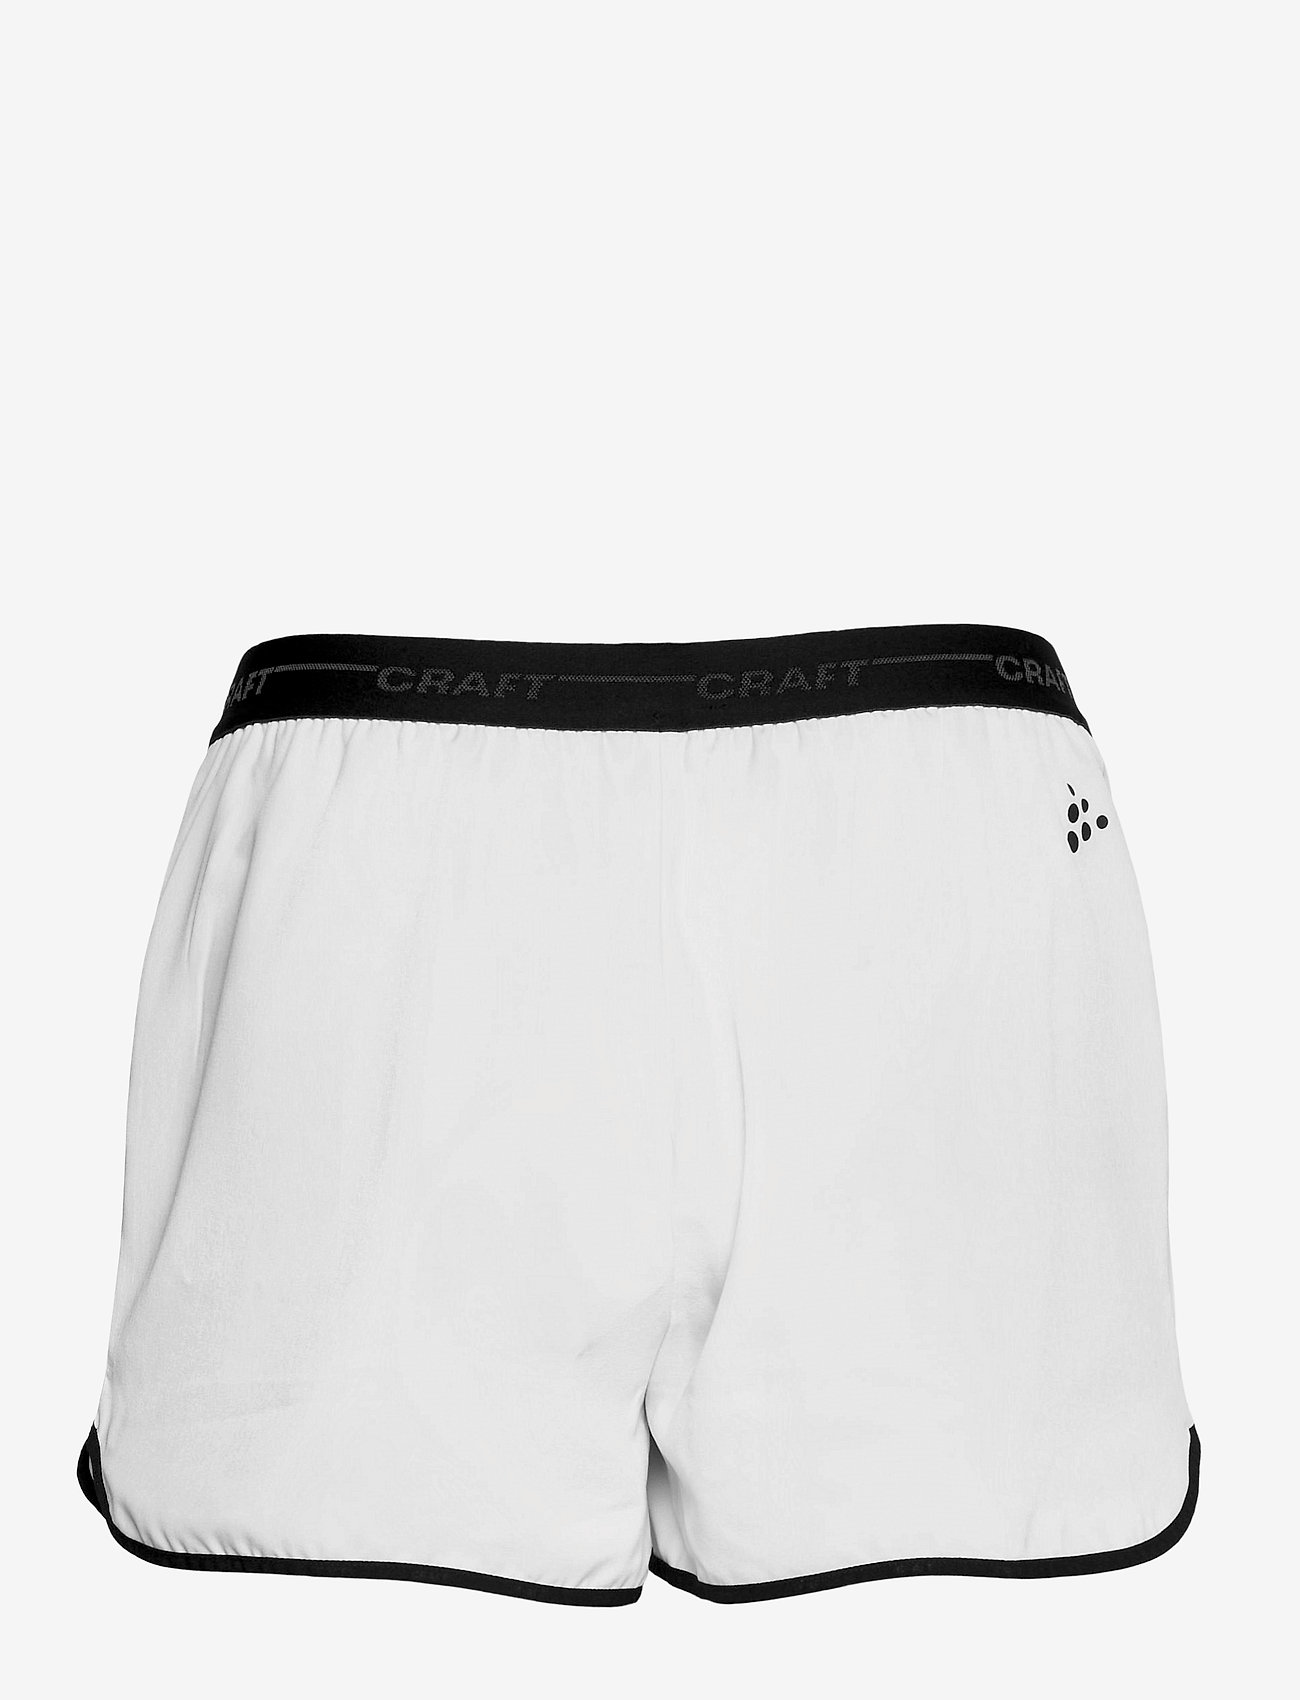 Craft - Pro Control Impact Shorts W - training korte broek - white/black - 1